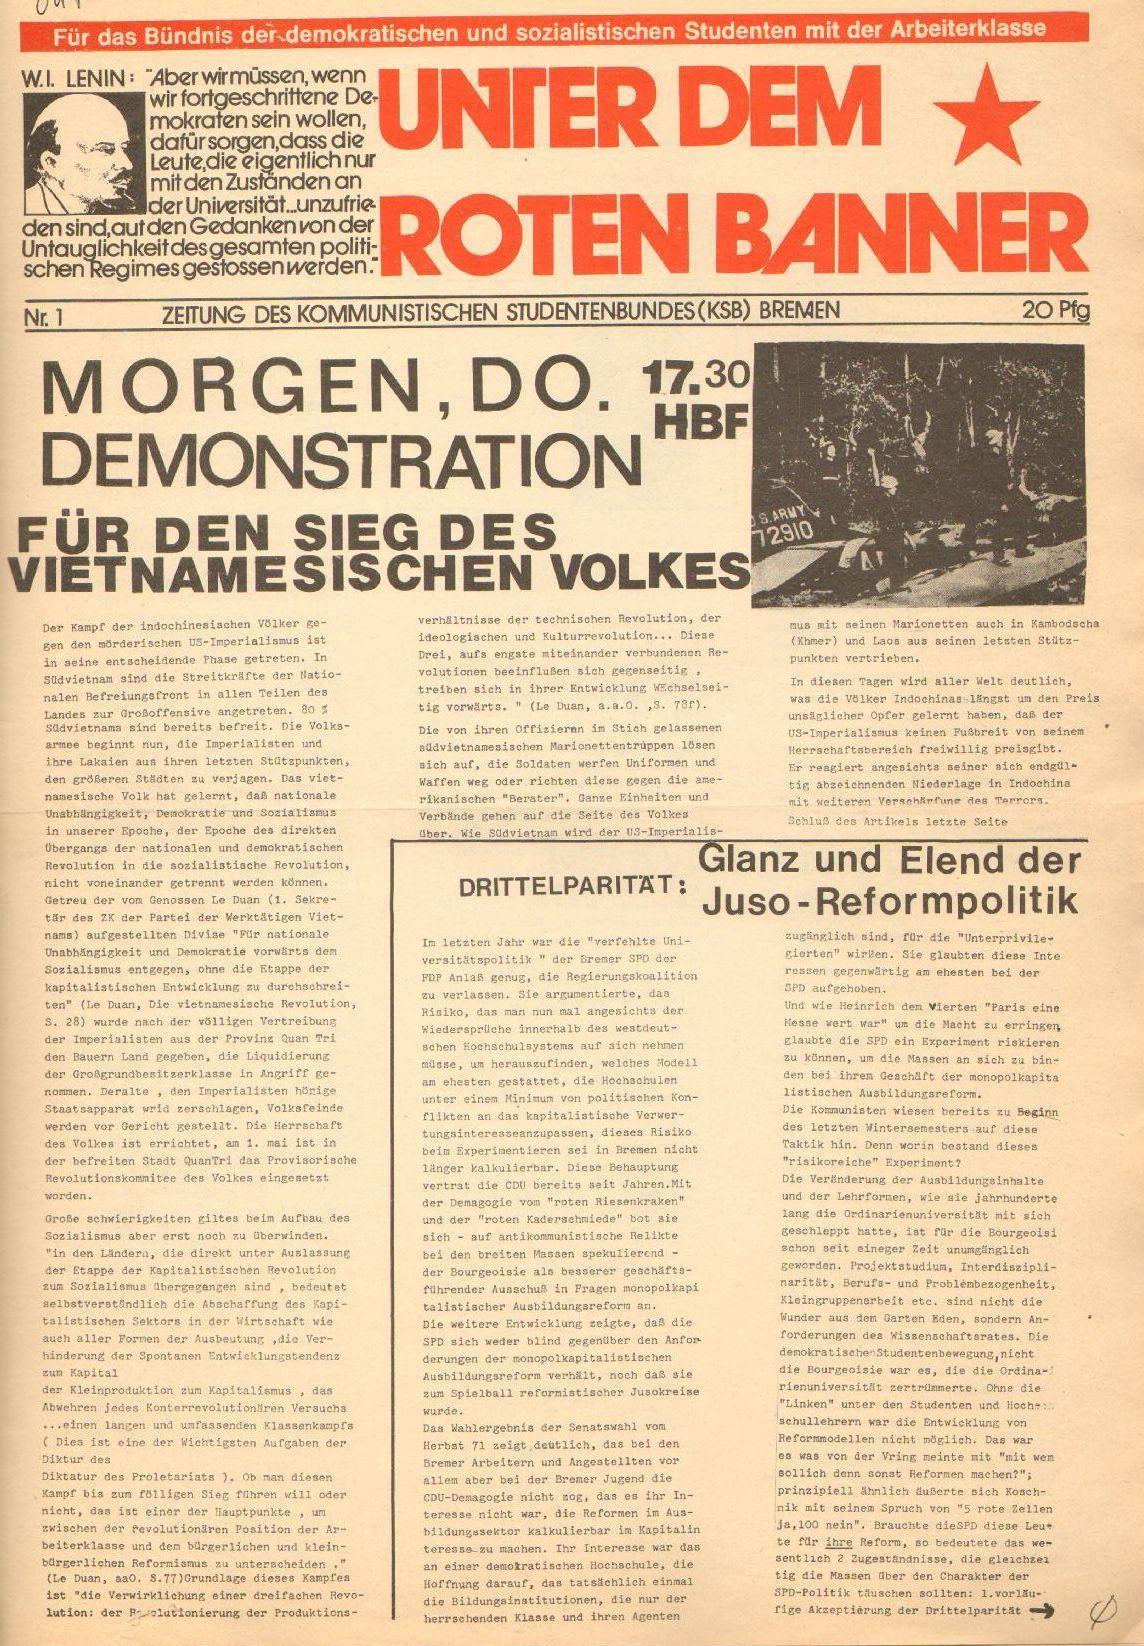 Bremen_Unter_dem_Roten_Banner001